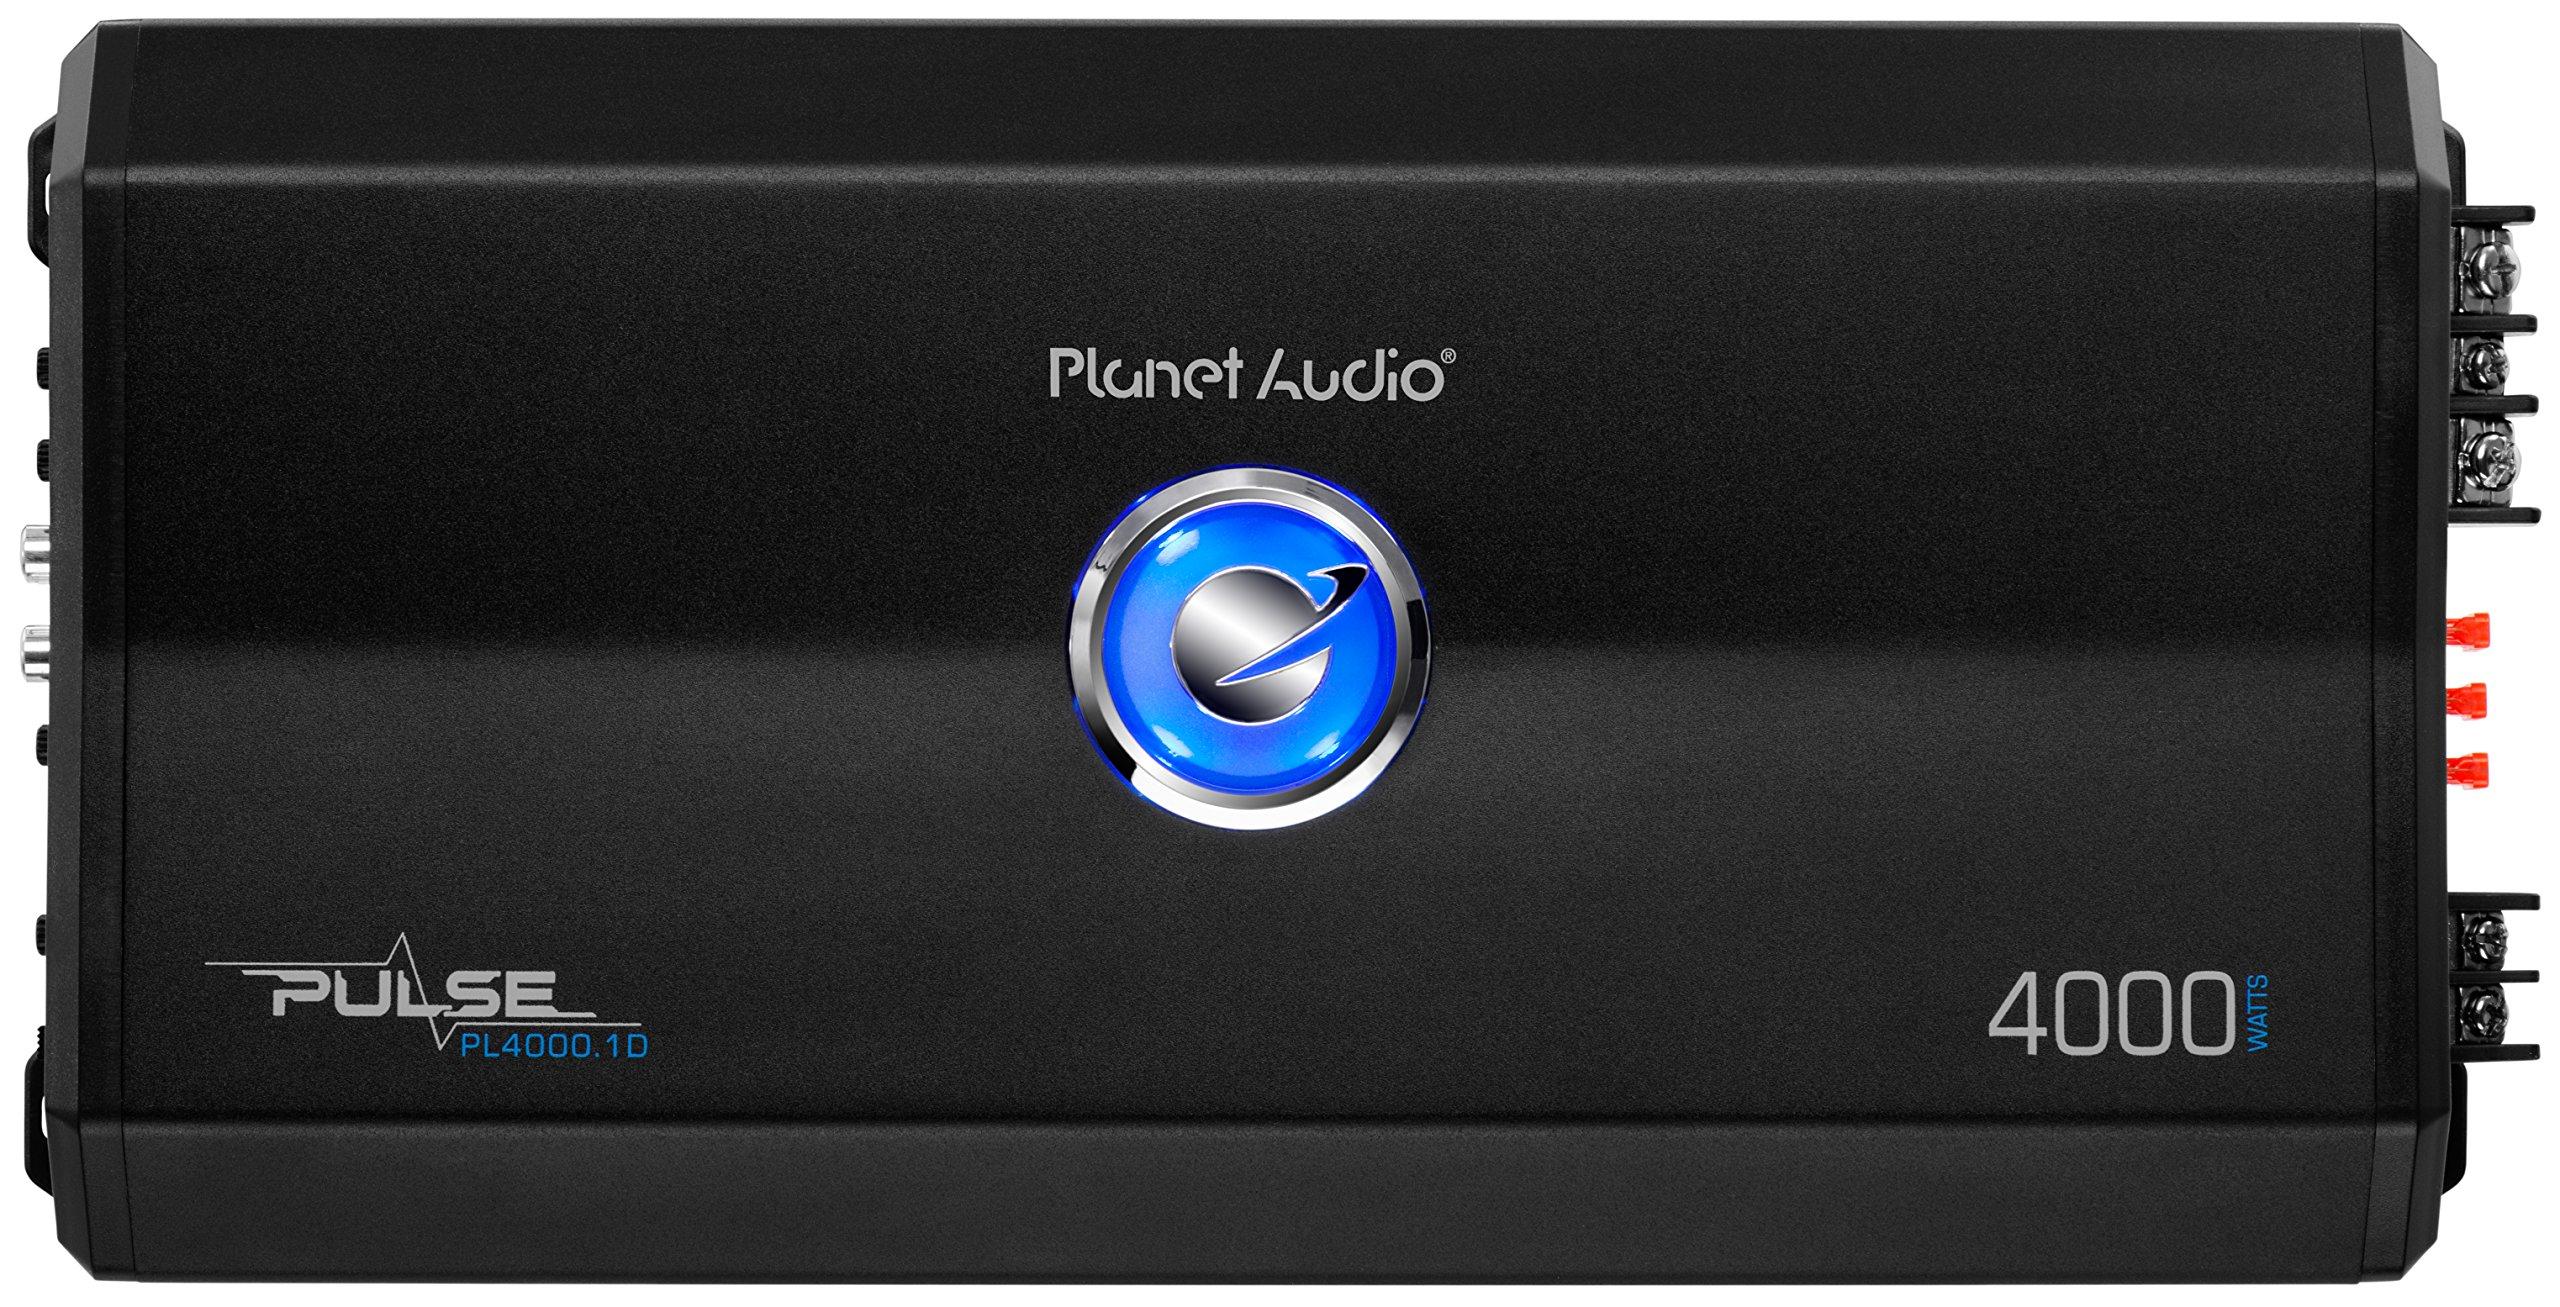 Planet Audio PL4000.1D Pulse 4000 Watt, 1 Ohm Stable Class D Monoblock Car Amplifier with Remote Subwoofer Control by Planet Audio (Image #1)